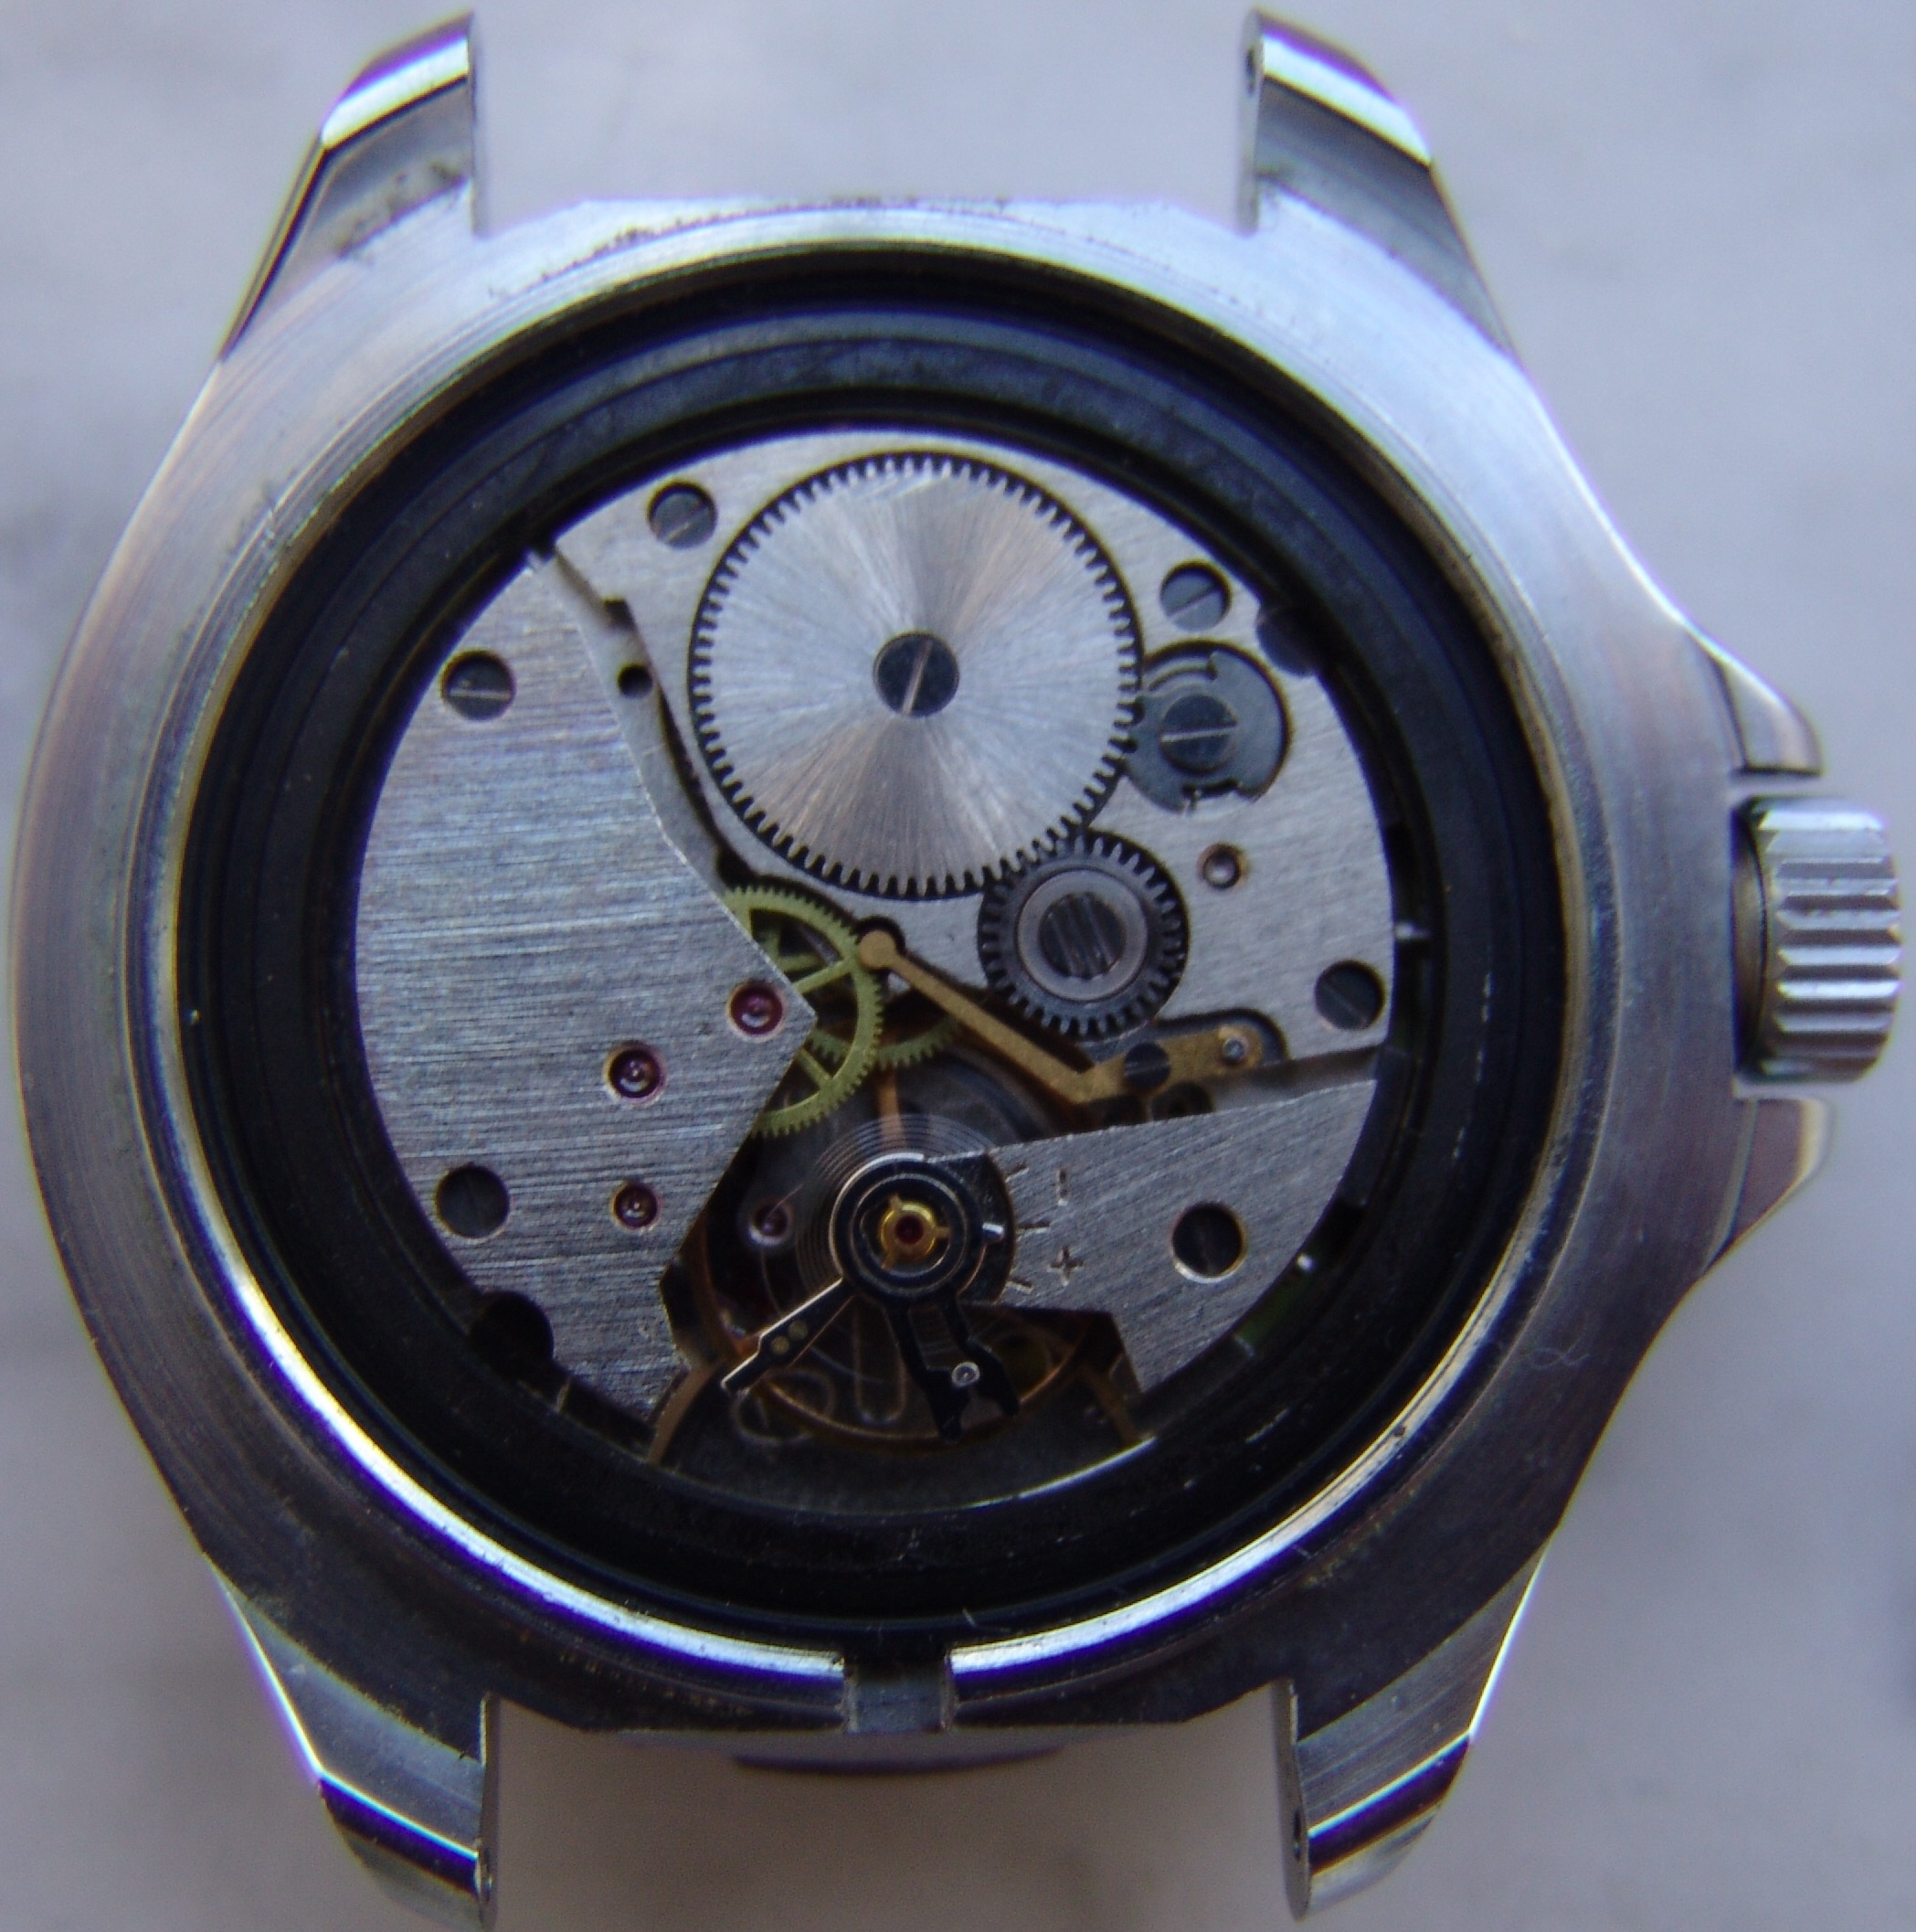 Vostok paternelle 150529071248130852